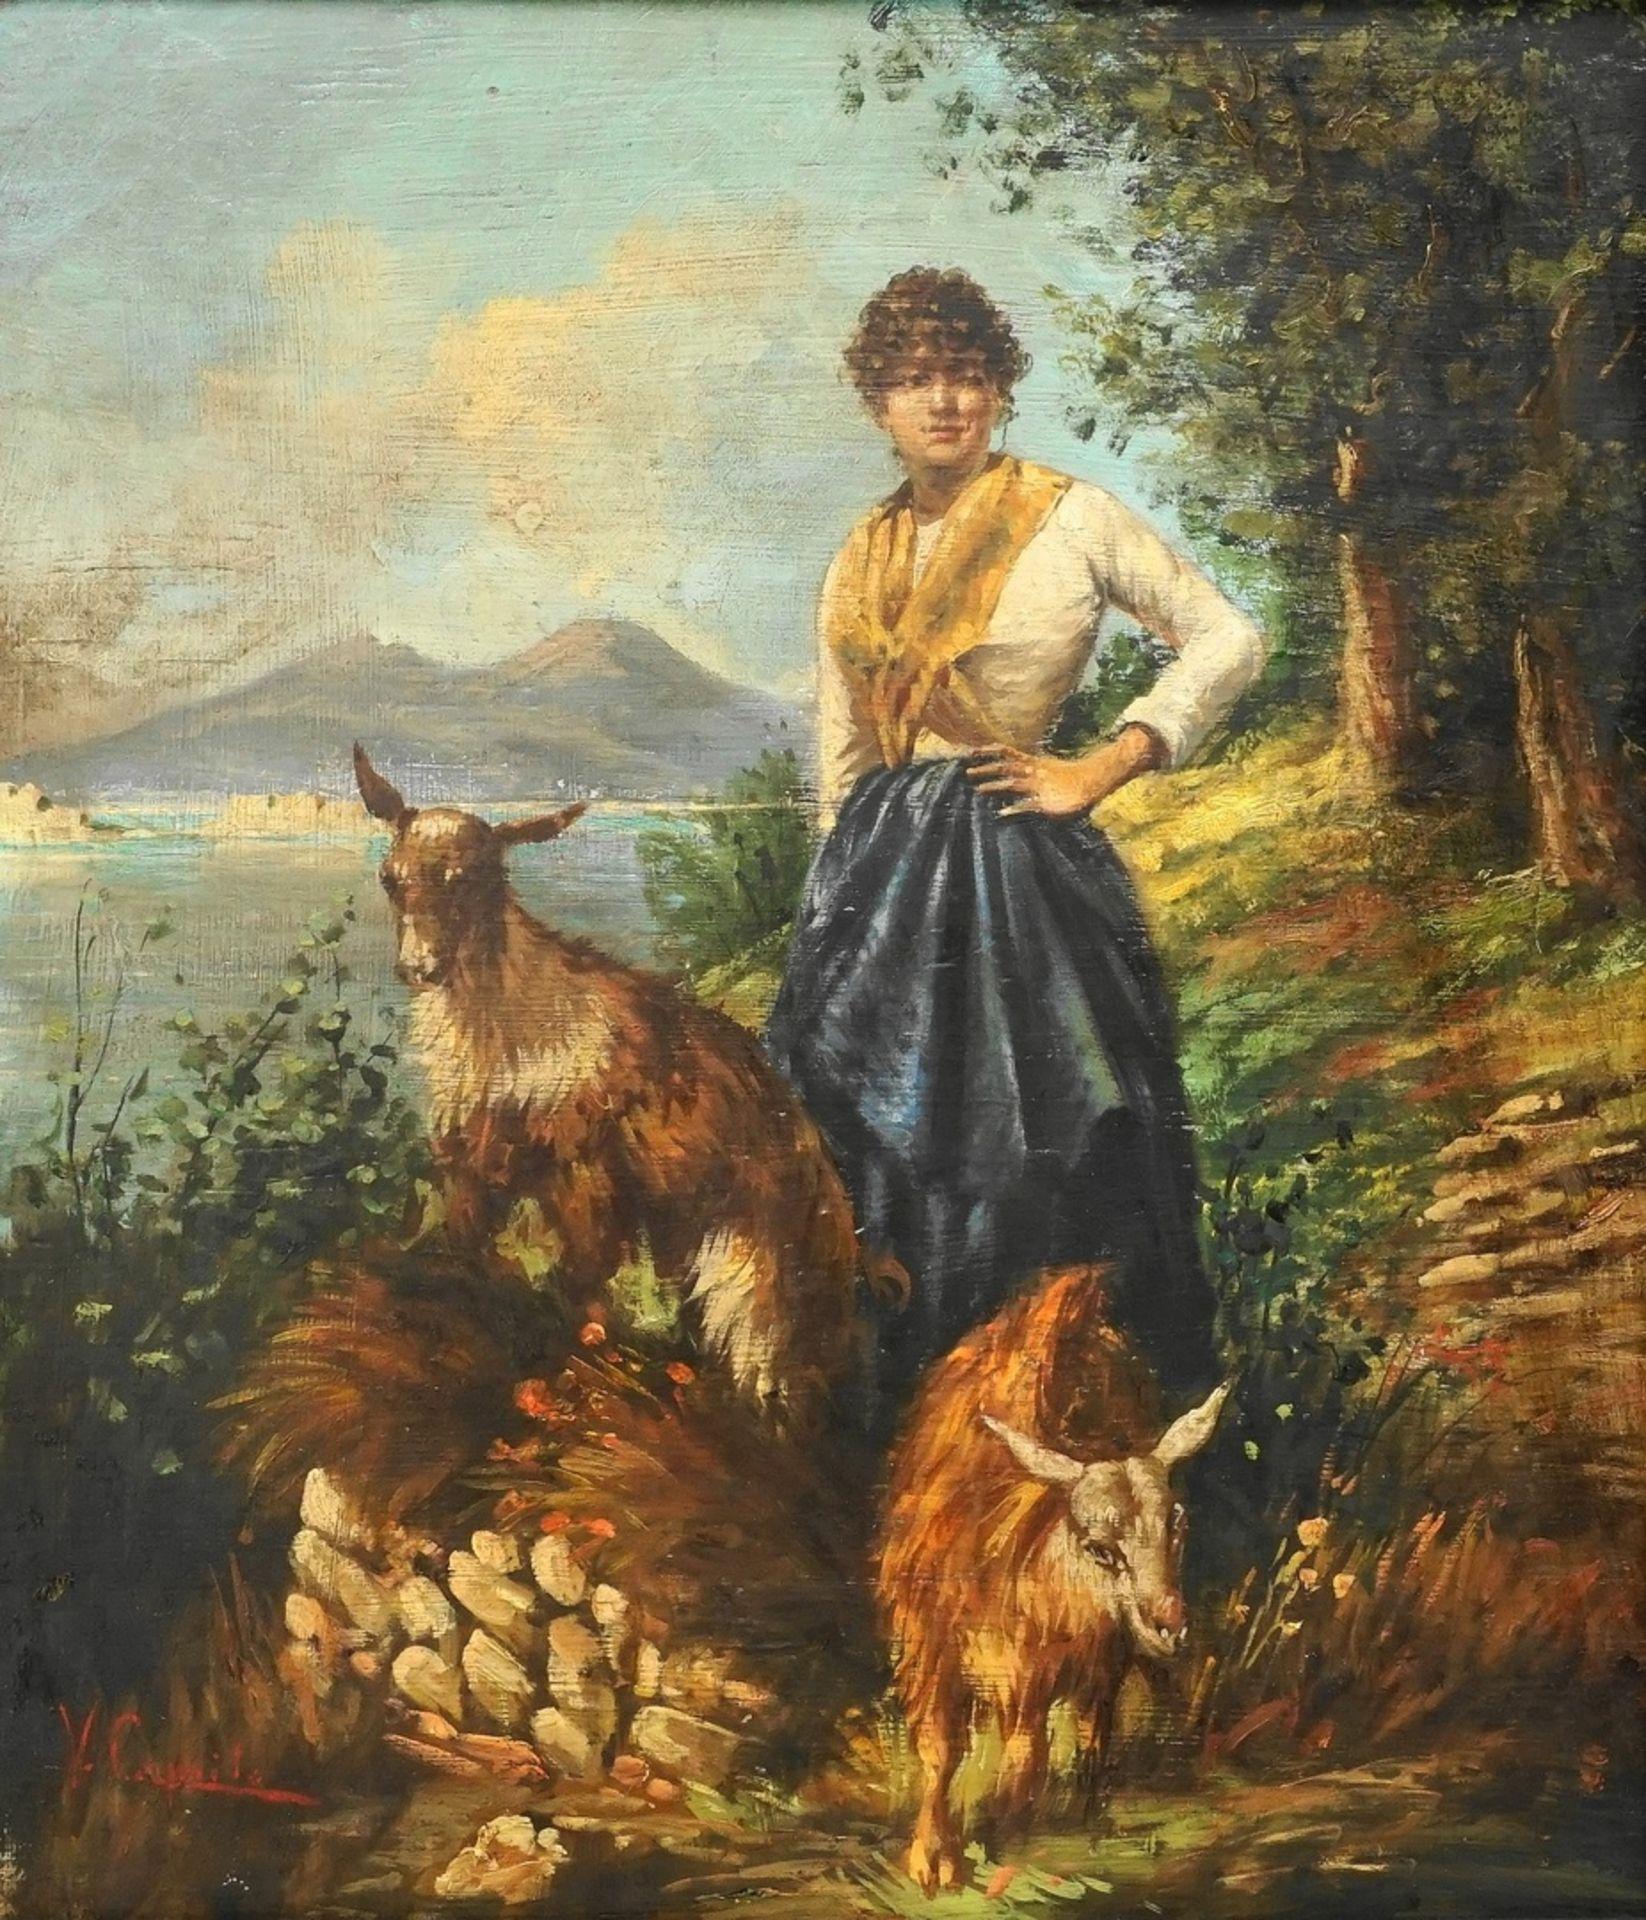 Vincenzo Caprile, Die Ziegenhirtin